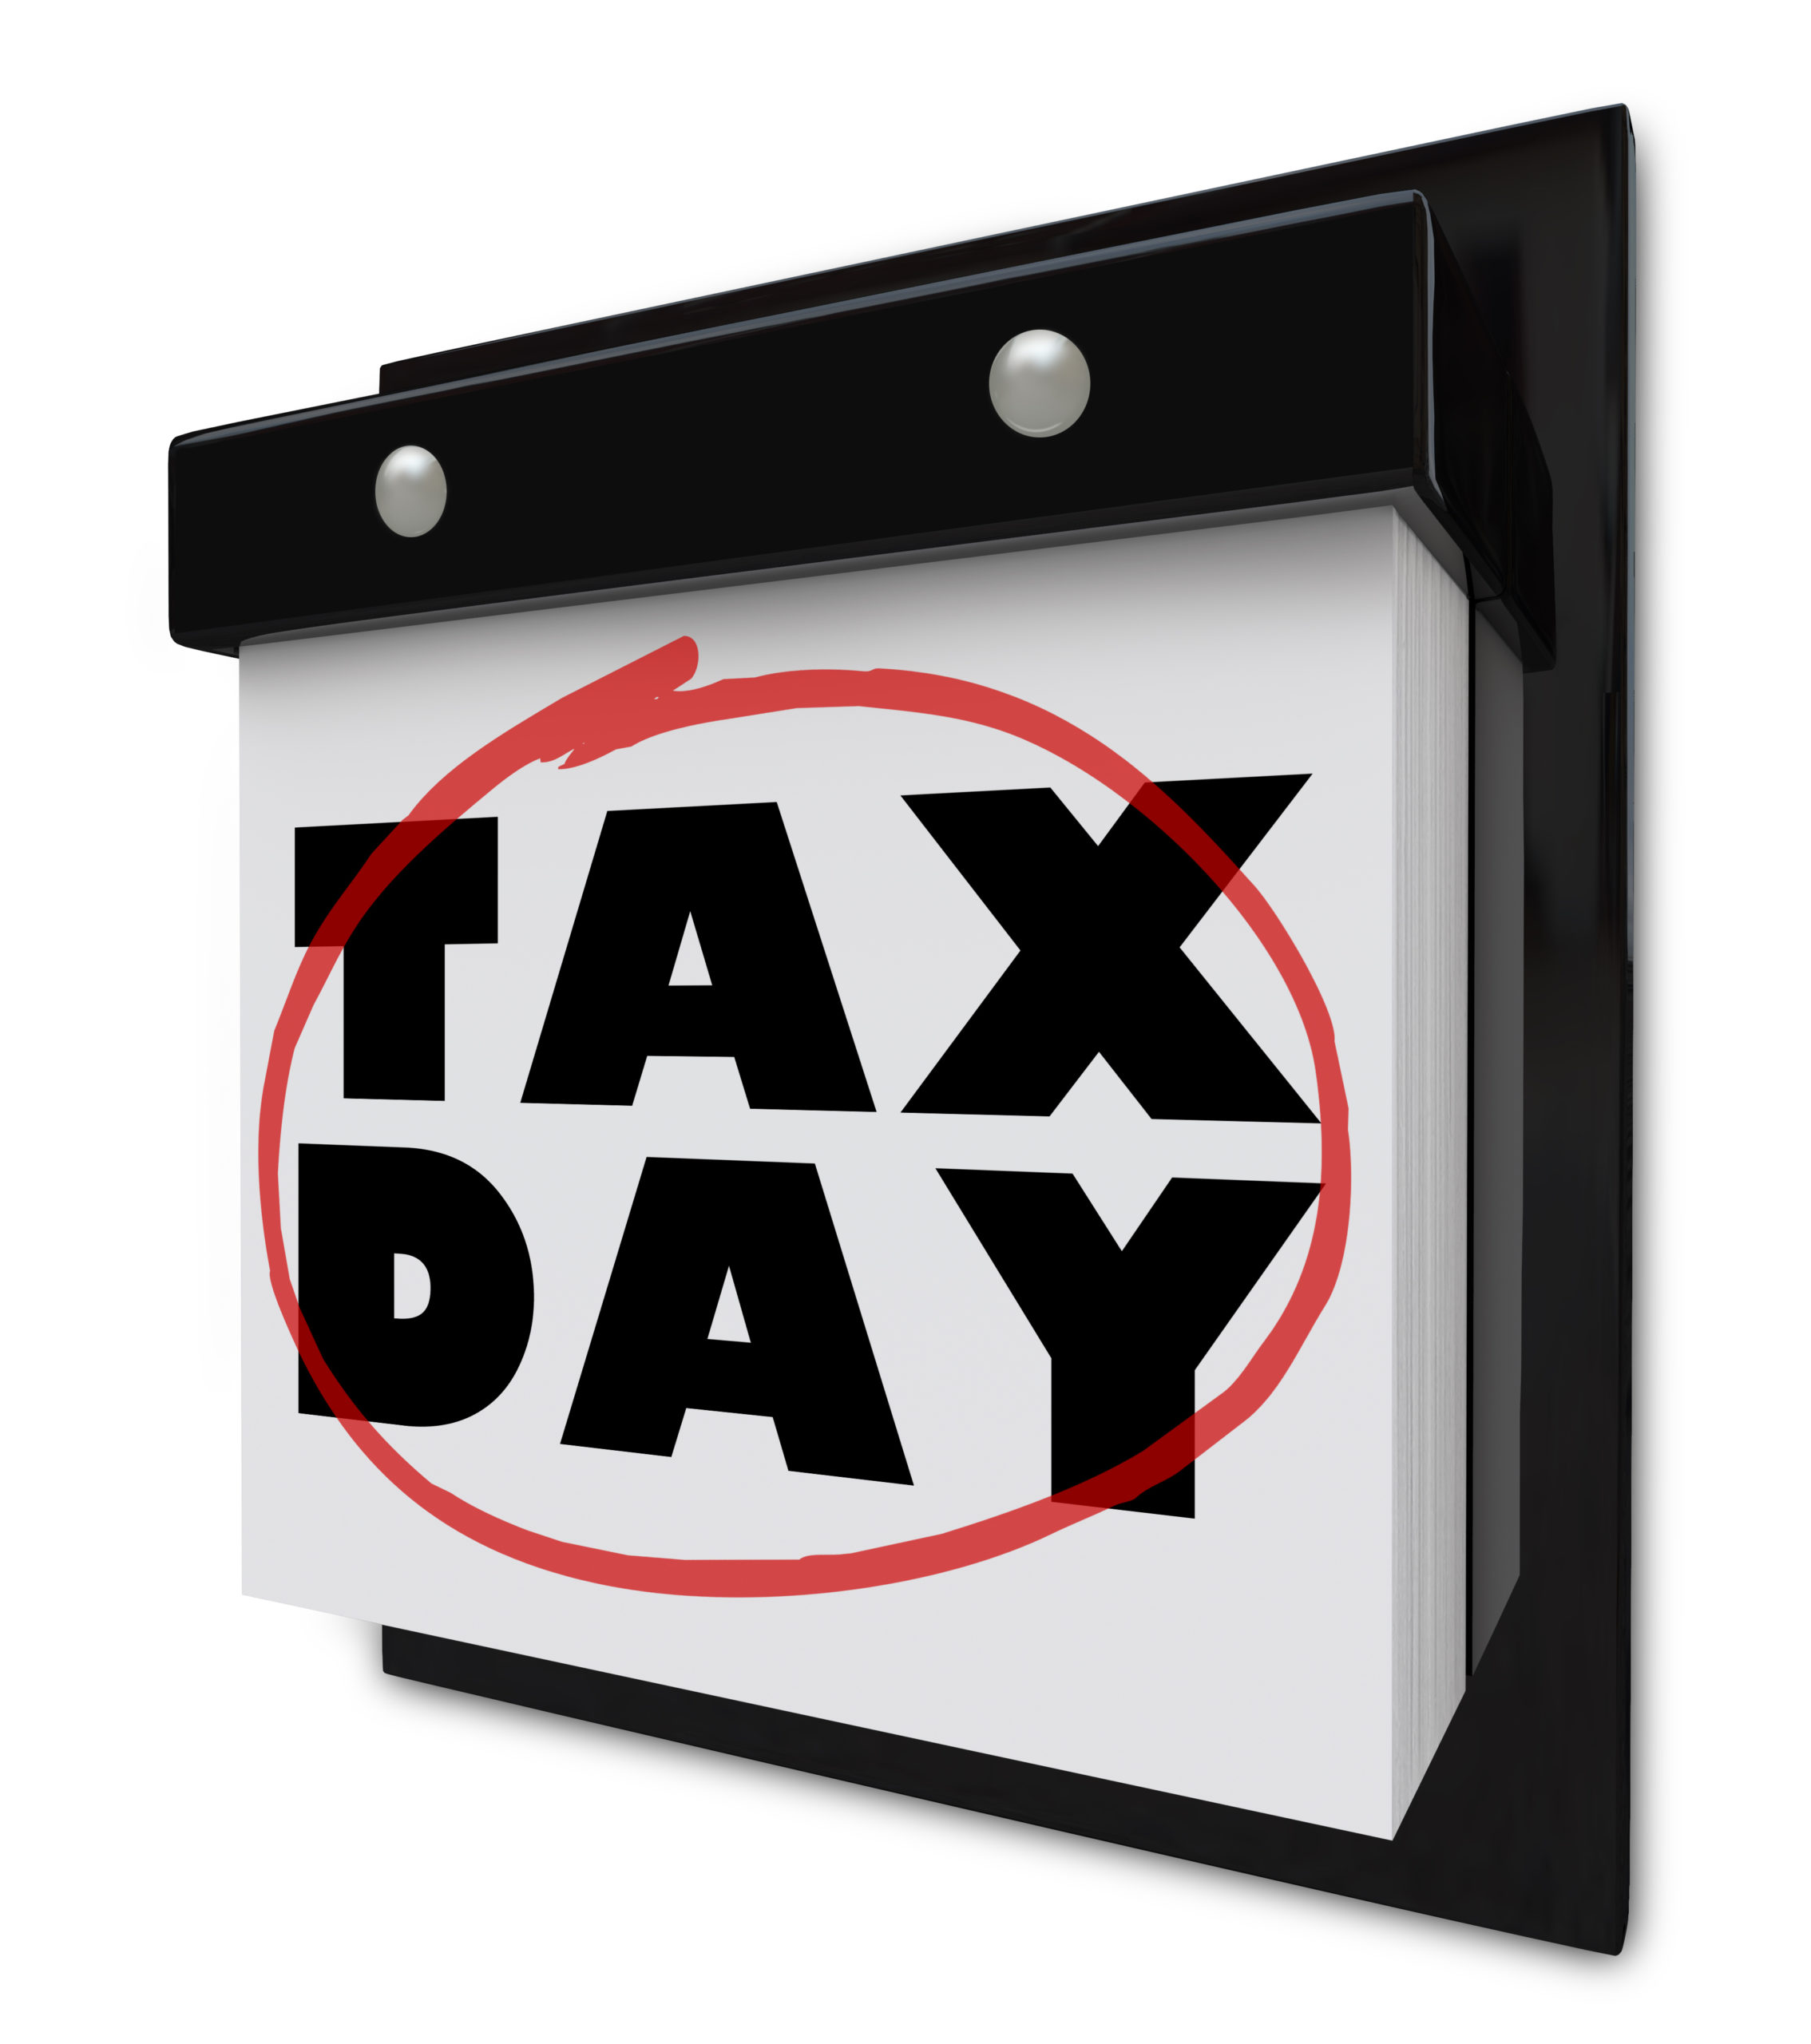 Calendar showing Tax Day